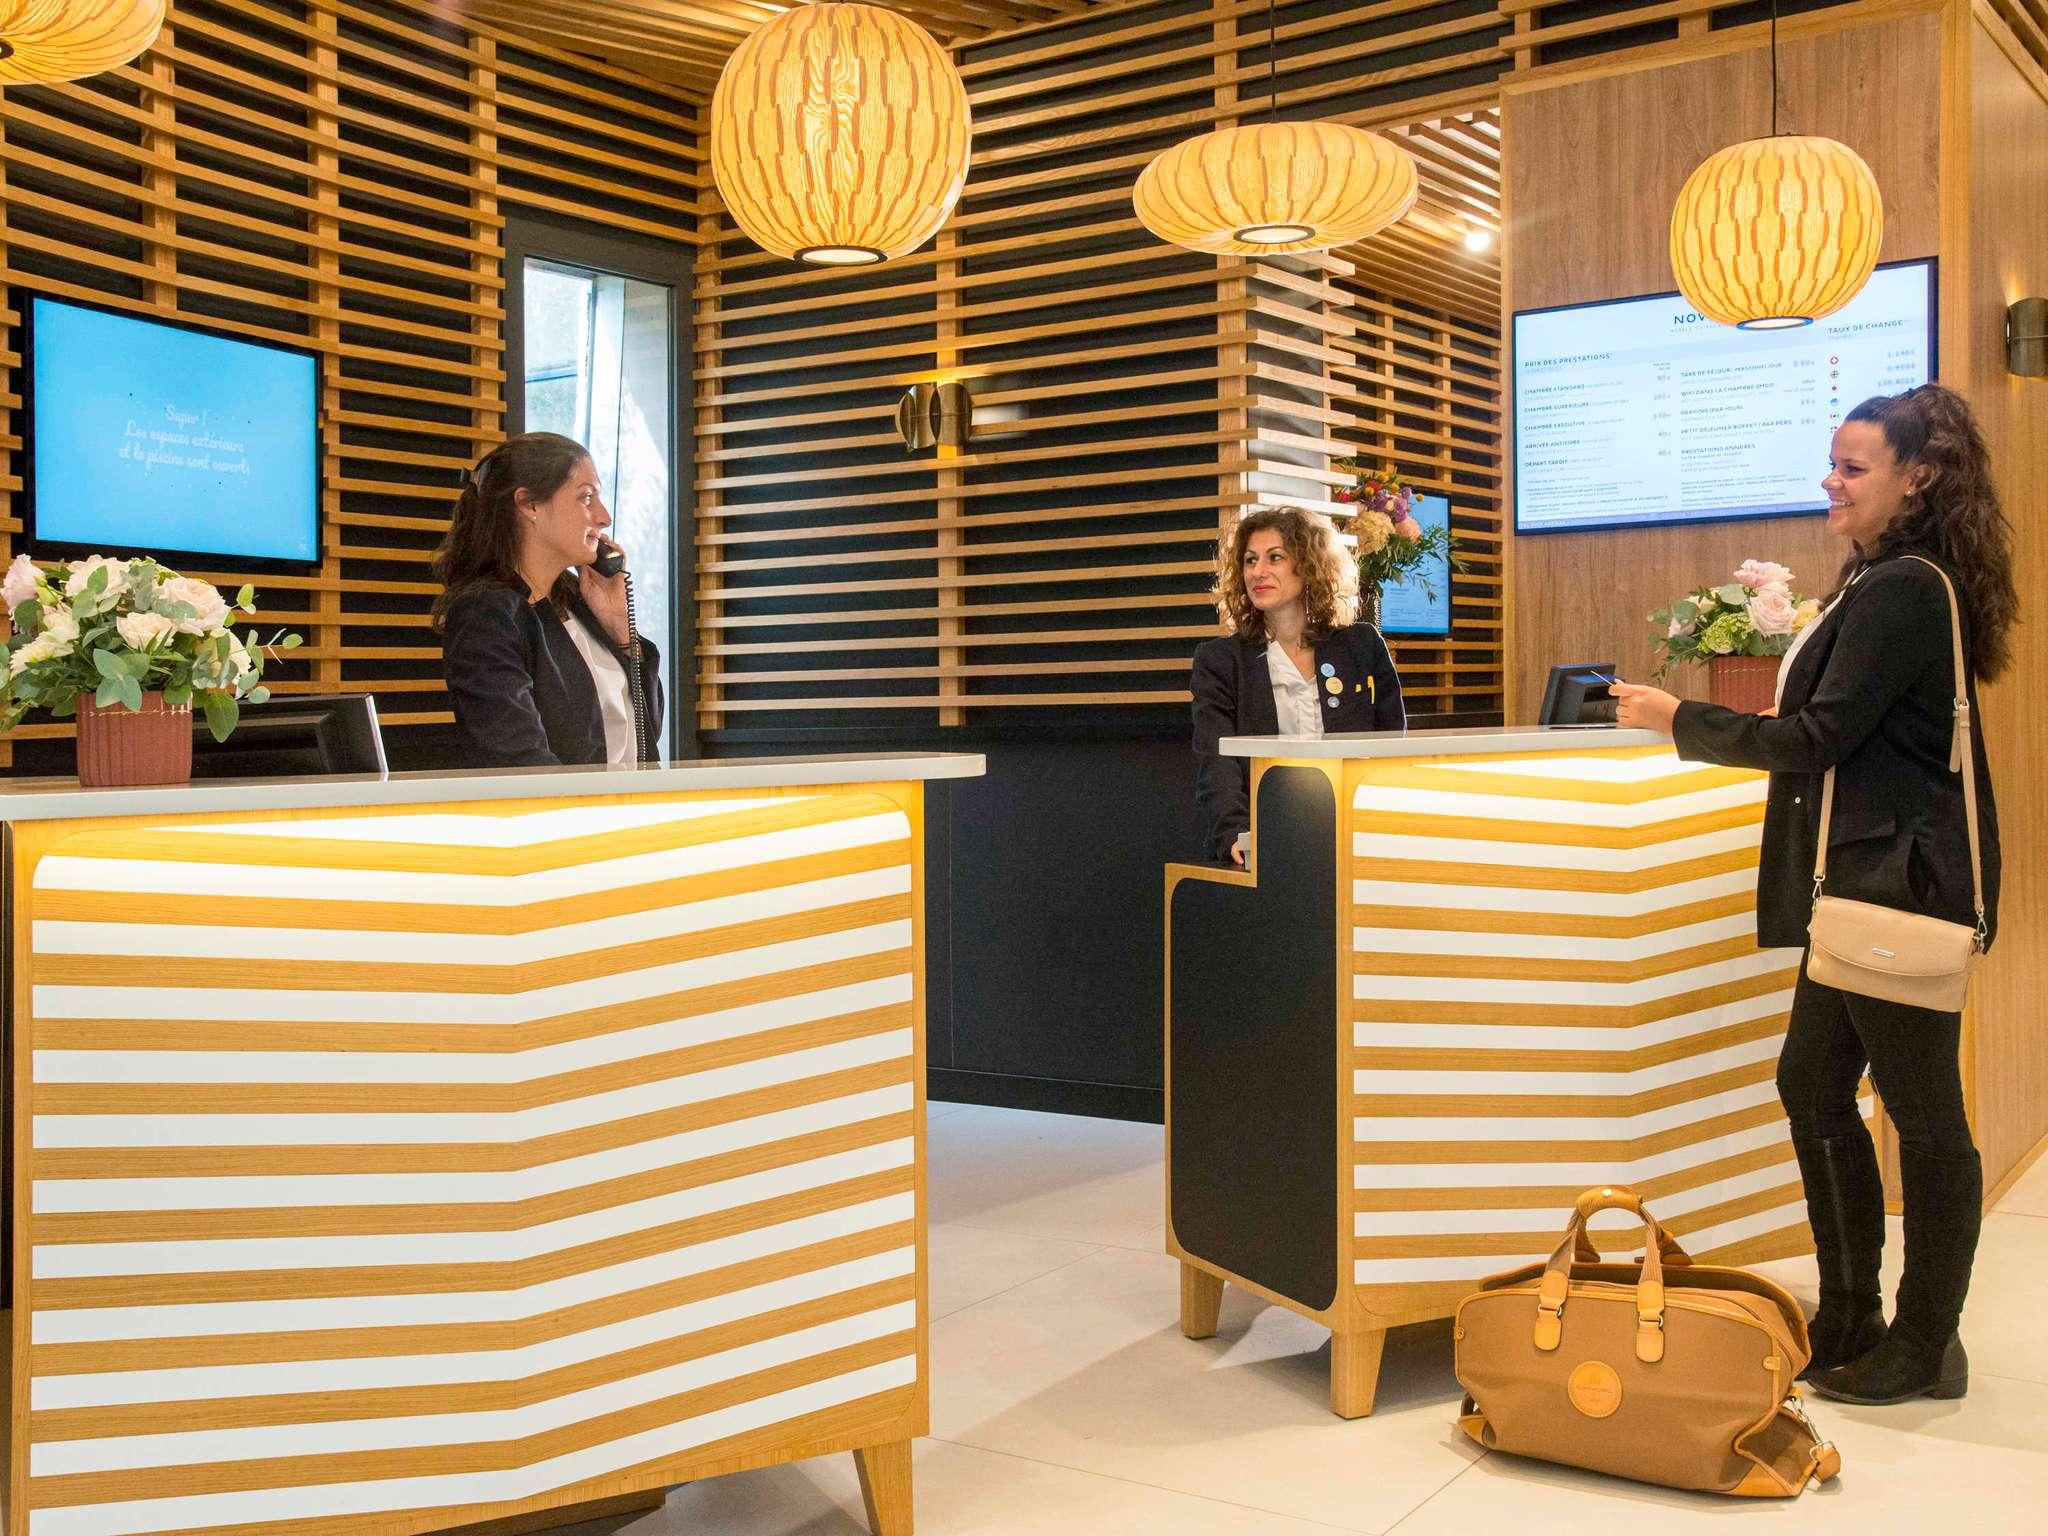 Hotel – Novotel Nice Arénas Aéroport